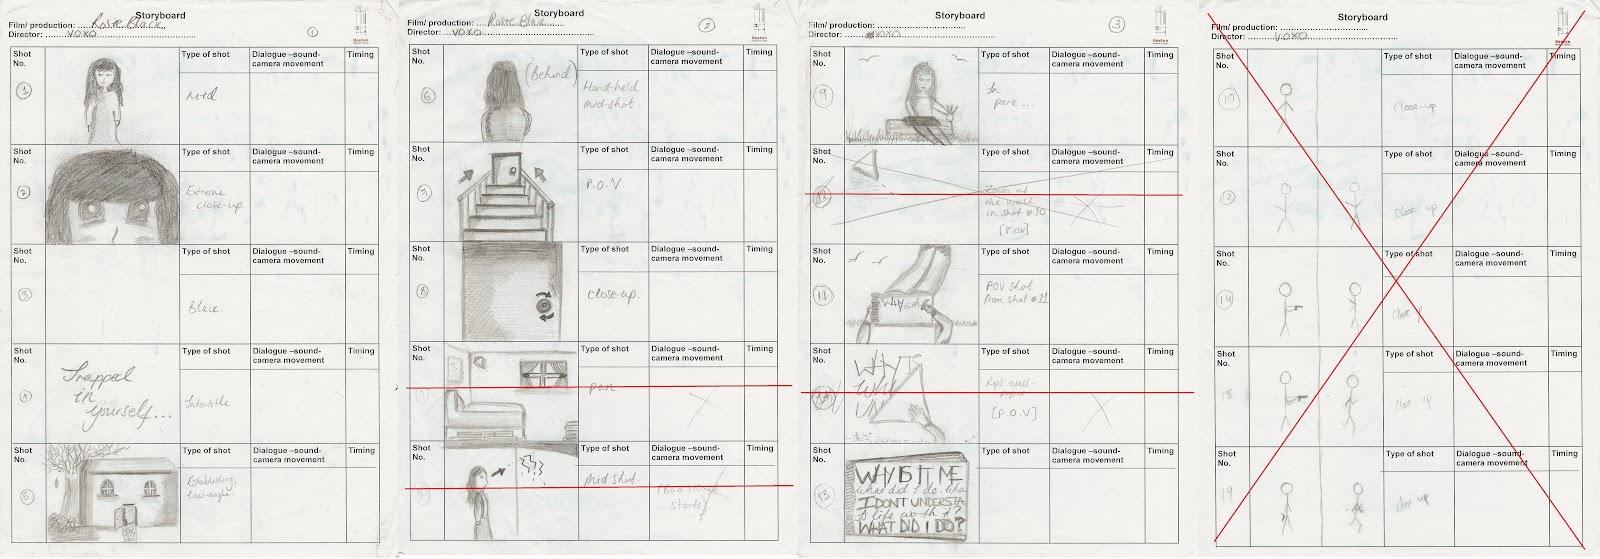 Inderpreet Gill A2 Media Blog: Storyboard